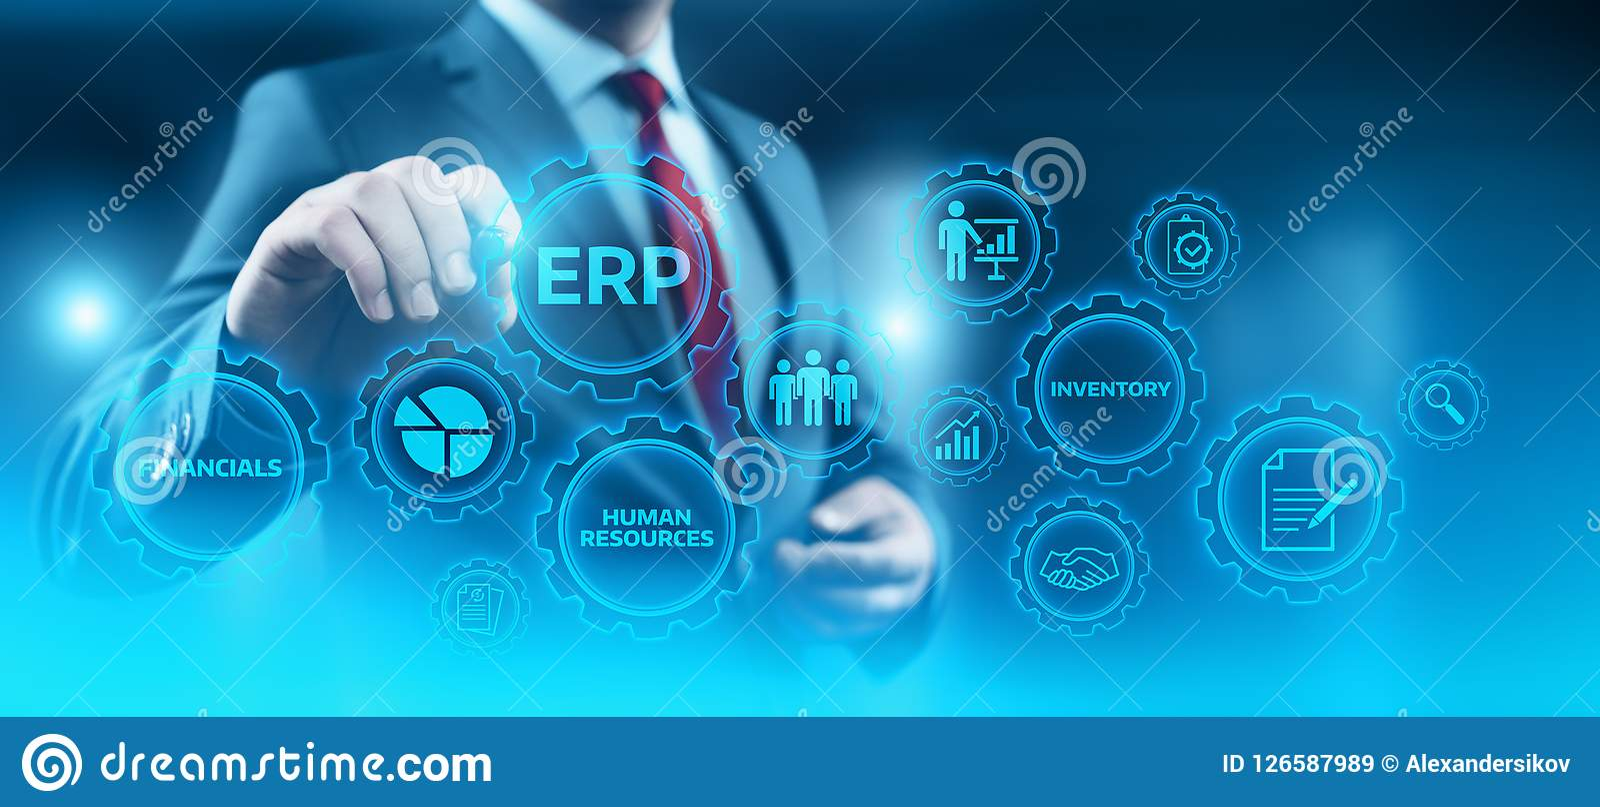 Enterprise Resource Planning ERP Corporate Company管理企业互联网技术概念